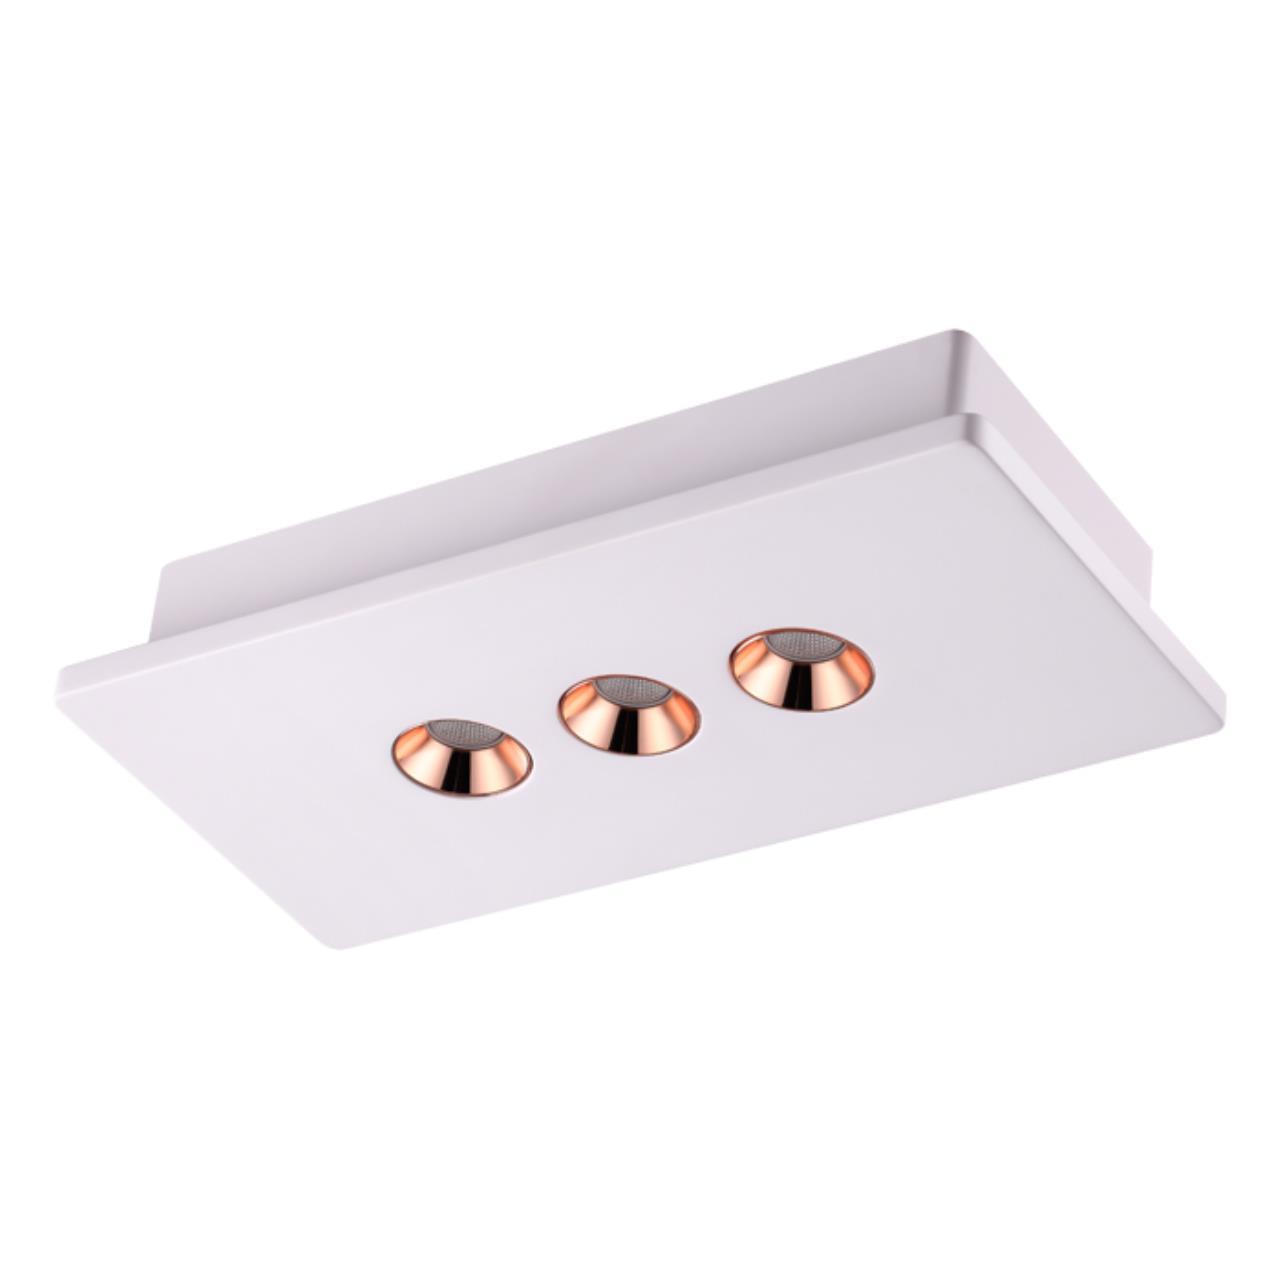 357940 OVER NT19 039 белый/медь Накладной светильник IP20 LED 3000К 12W 220-240V CARO